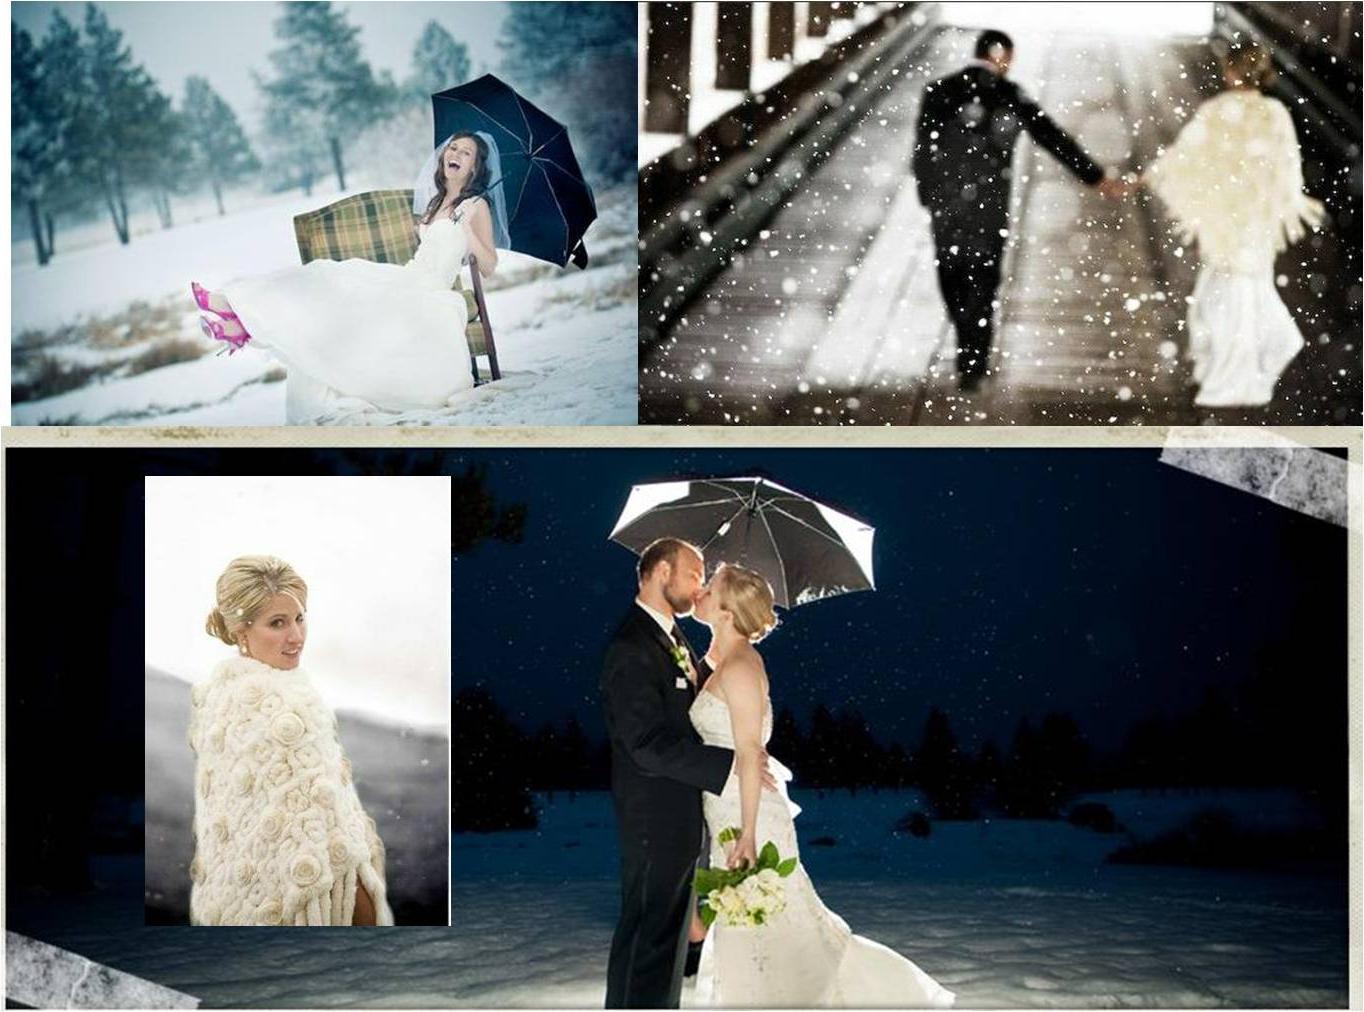 just love winter weddings,